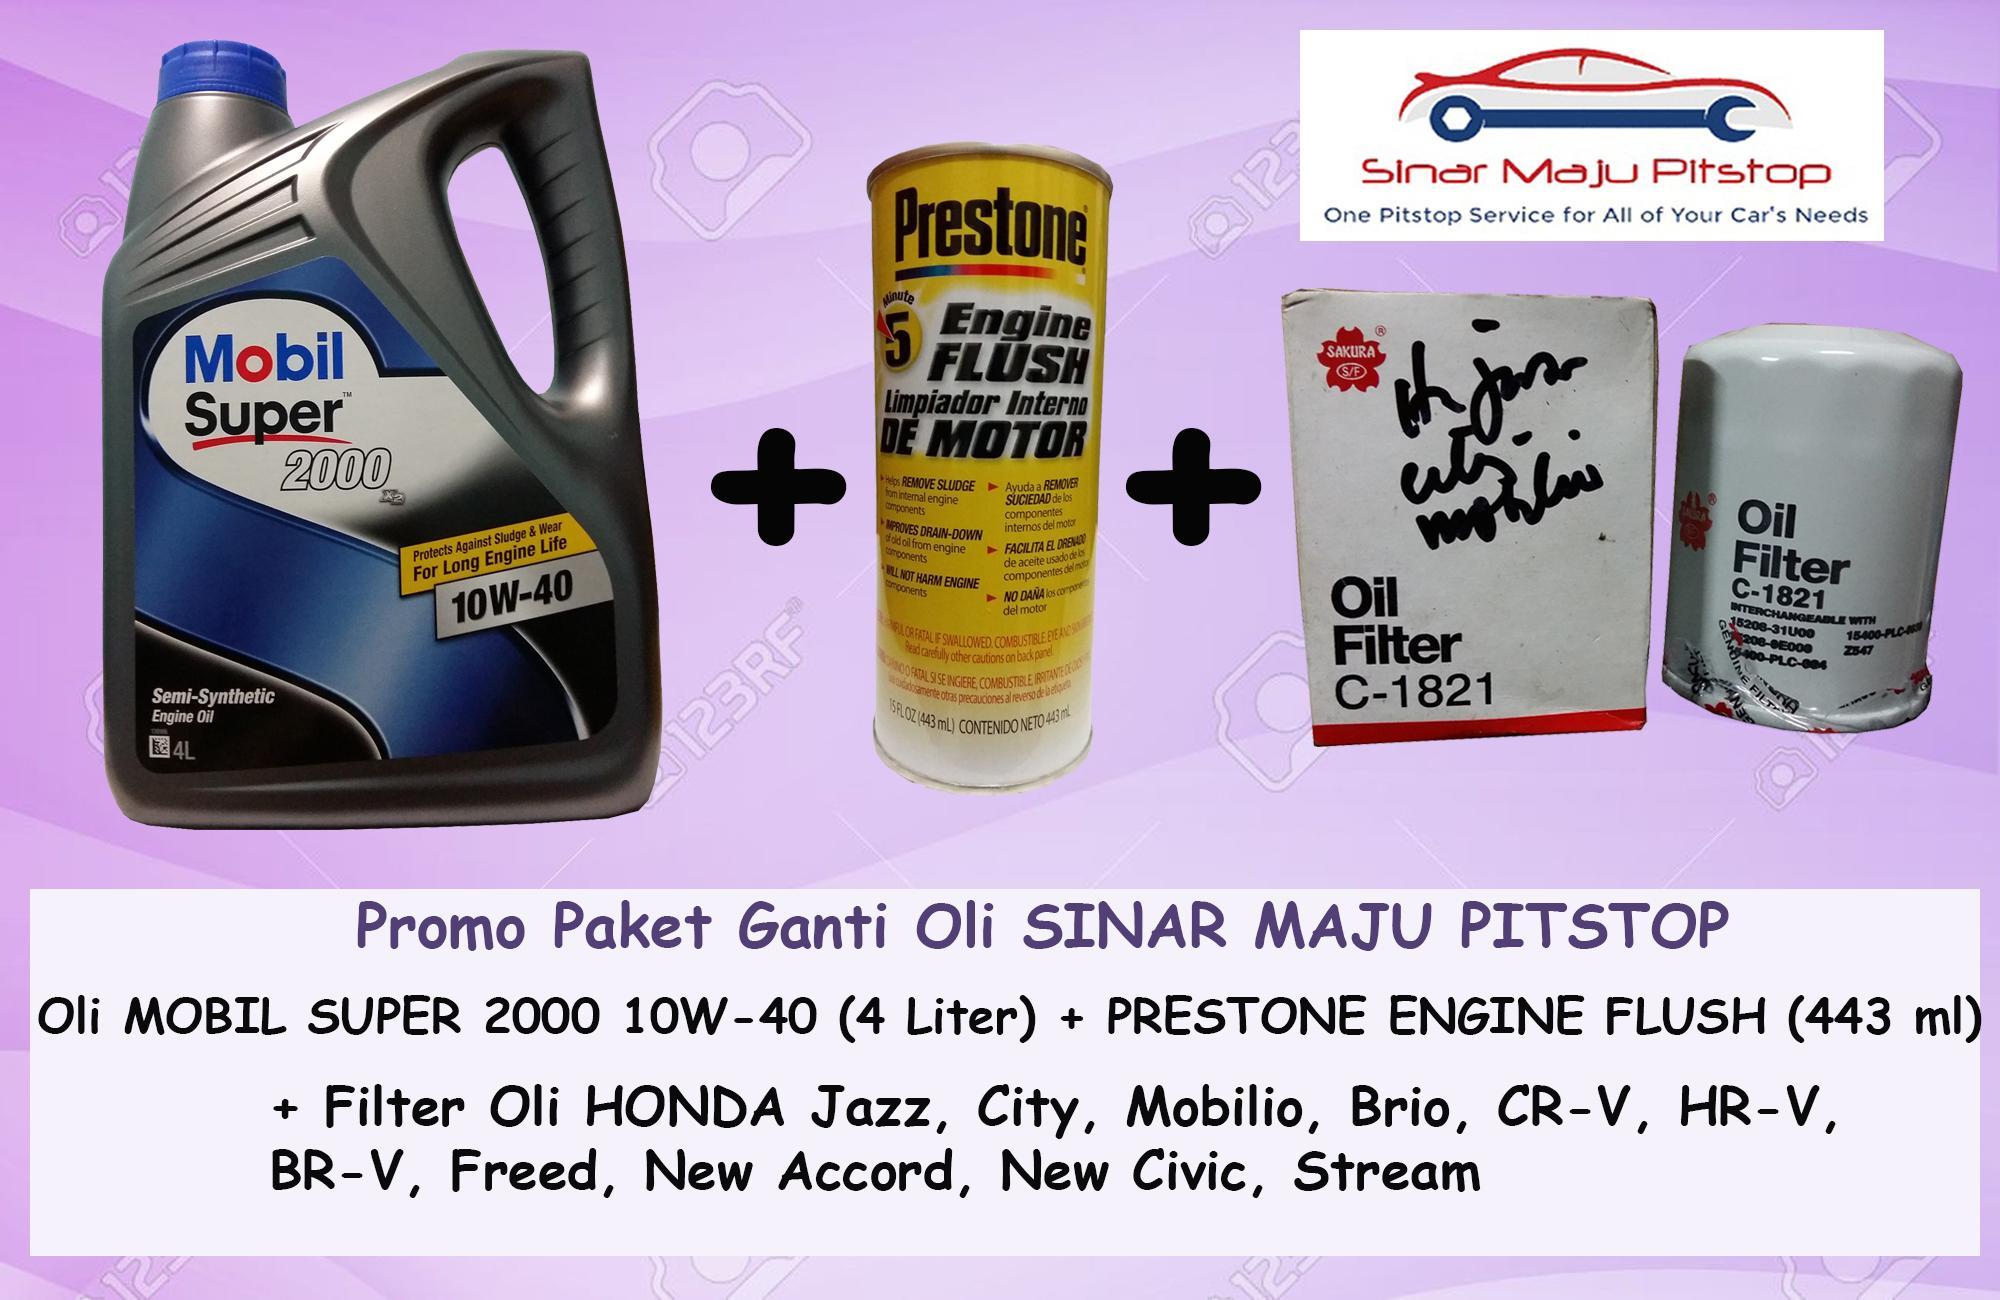 Promo Paket Ganti Oli MOBIL SUPER 2000 10W 40 API SN 4 LITER Prestone